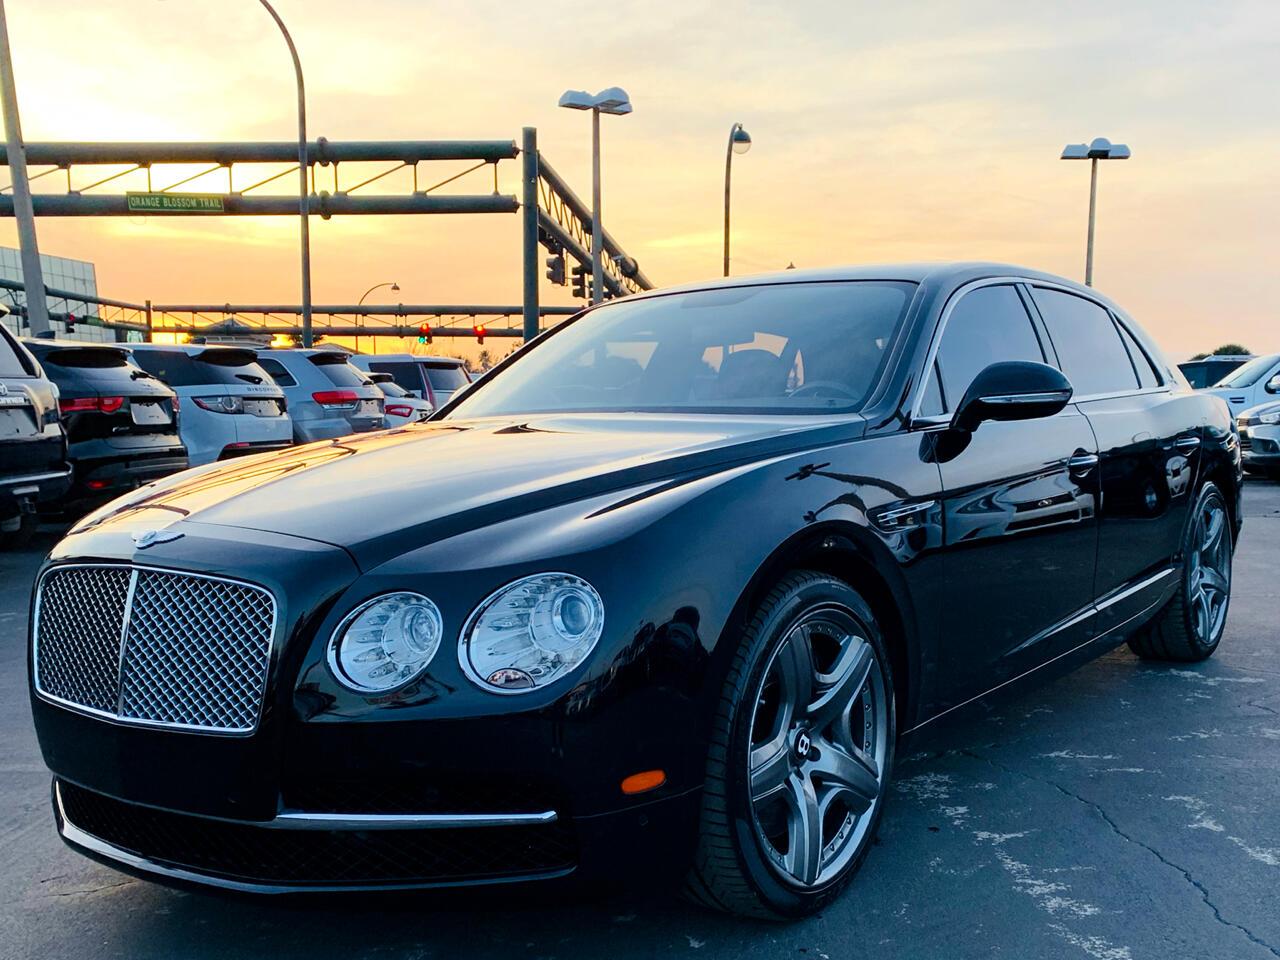 Bentley Continental Flying Spur Sedan 2014